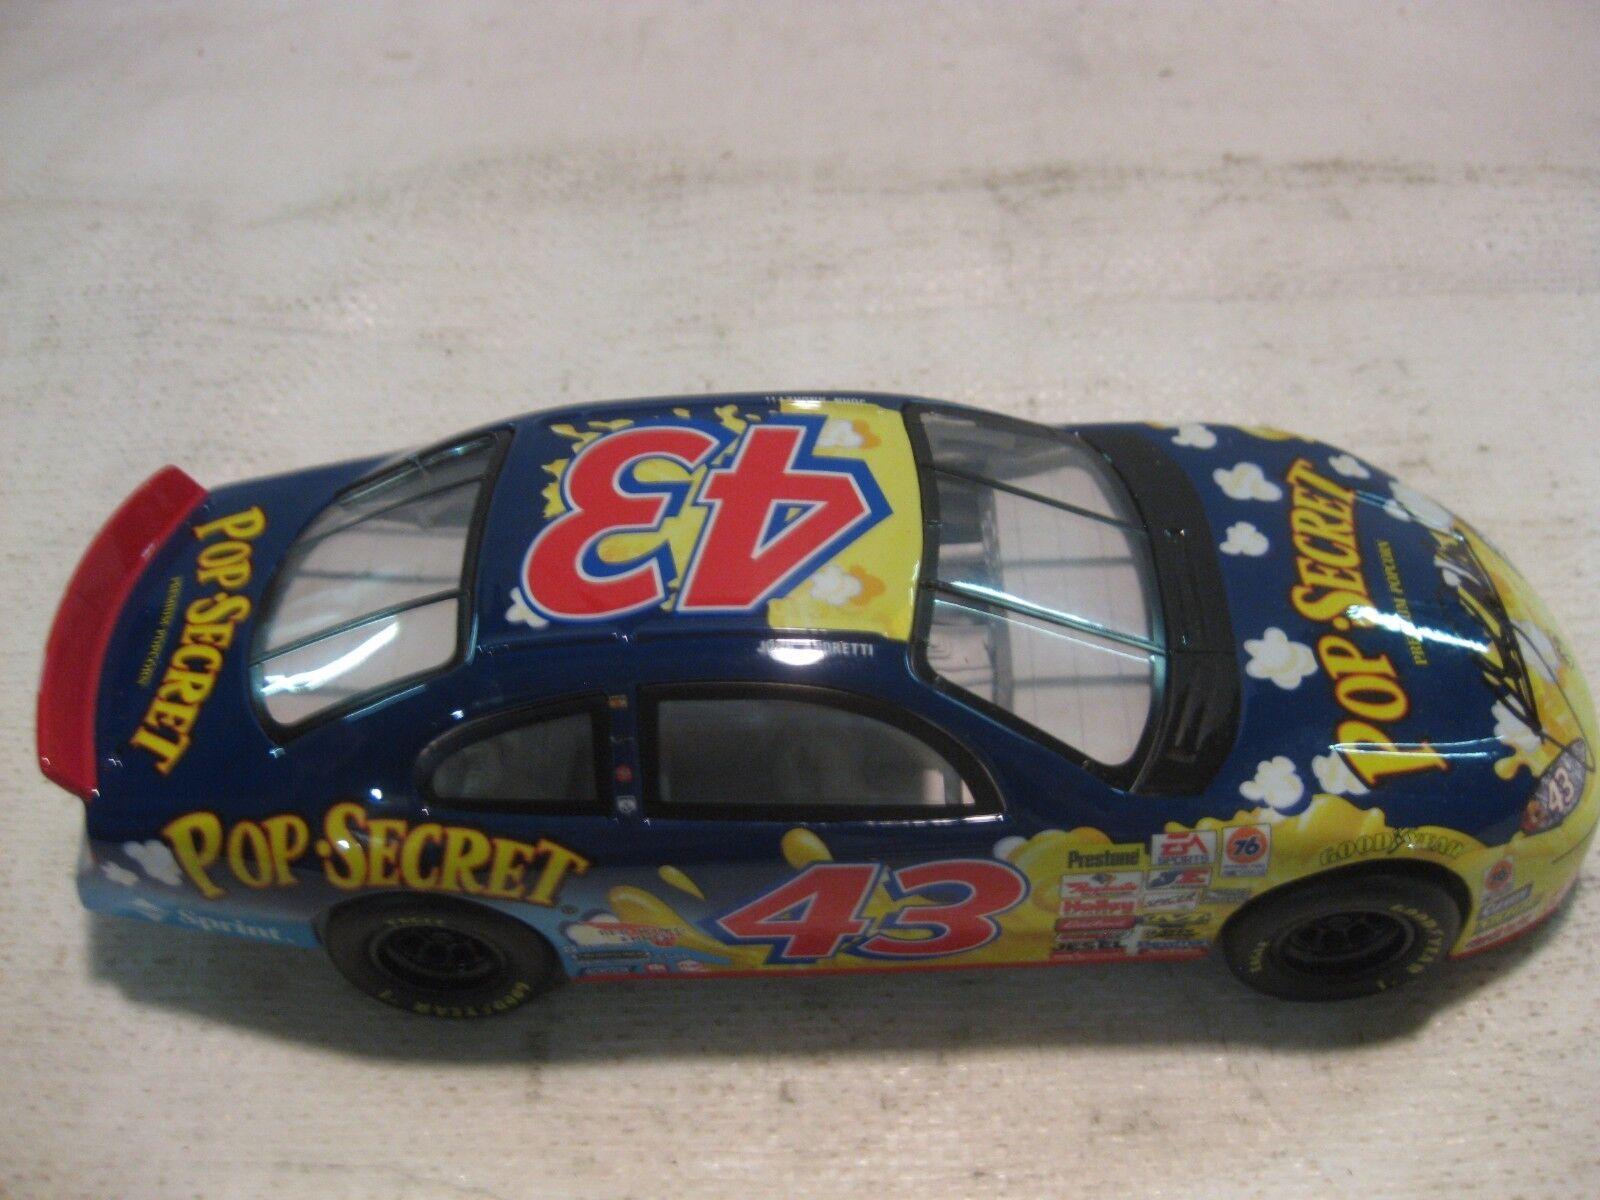 Nascar John Andretti Pop Secret Dodge RT 124 Scale Diecast Mattel 2000 dc681